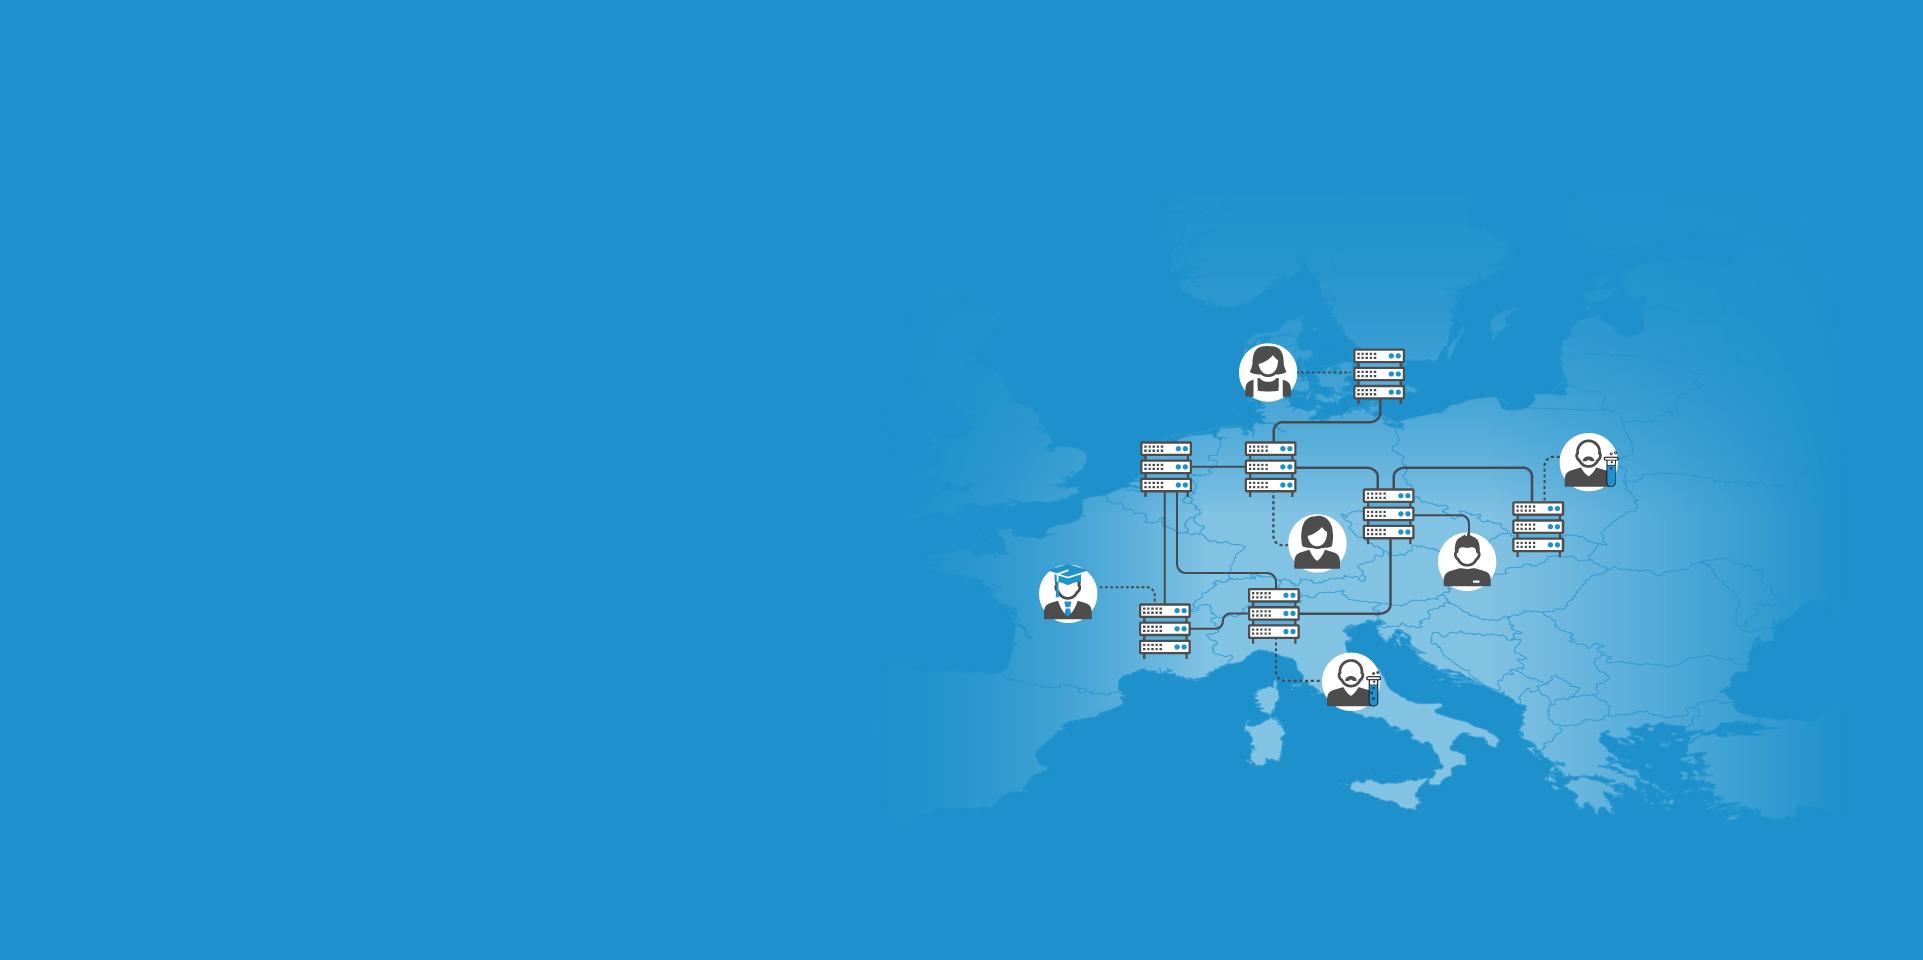 https://www.cs3mesh4eosc.eu/sites/default/files/revslider/image/CS3MESH4EOSC_Website_Slider_2D6_Oct2020.png